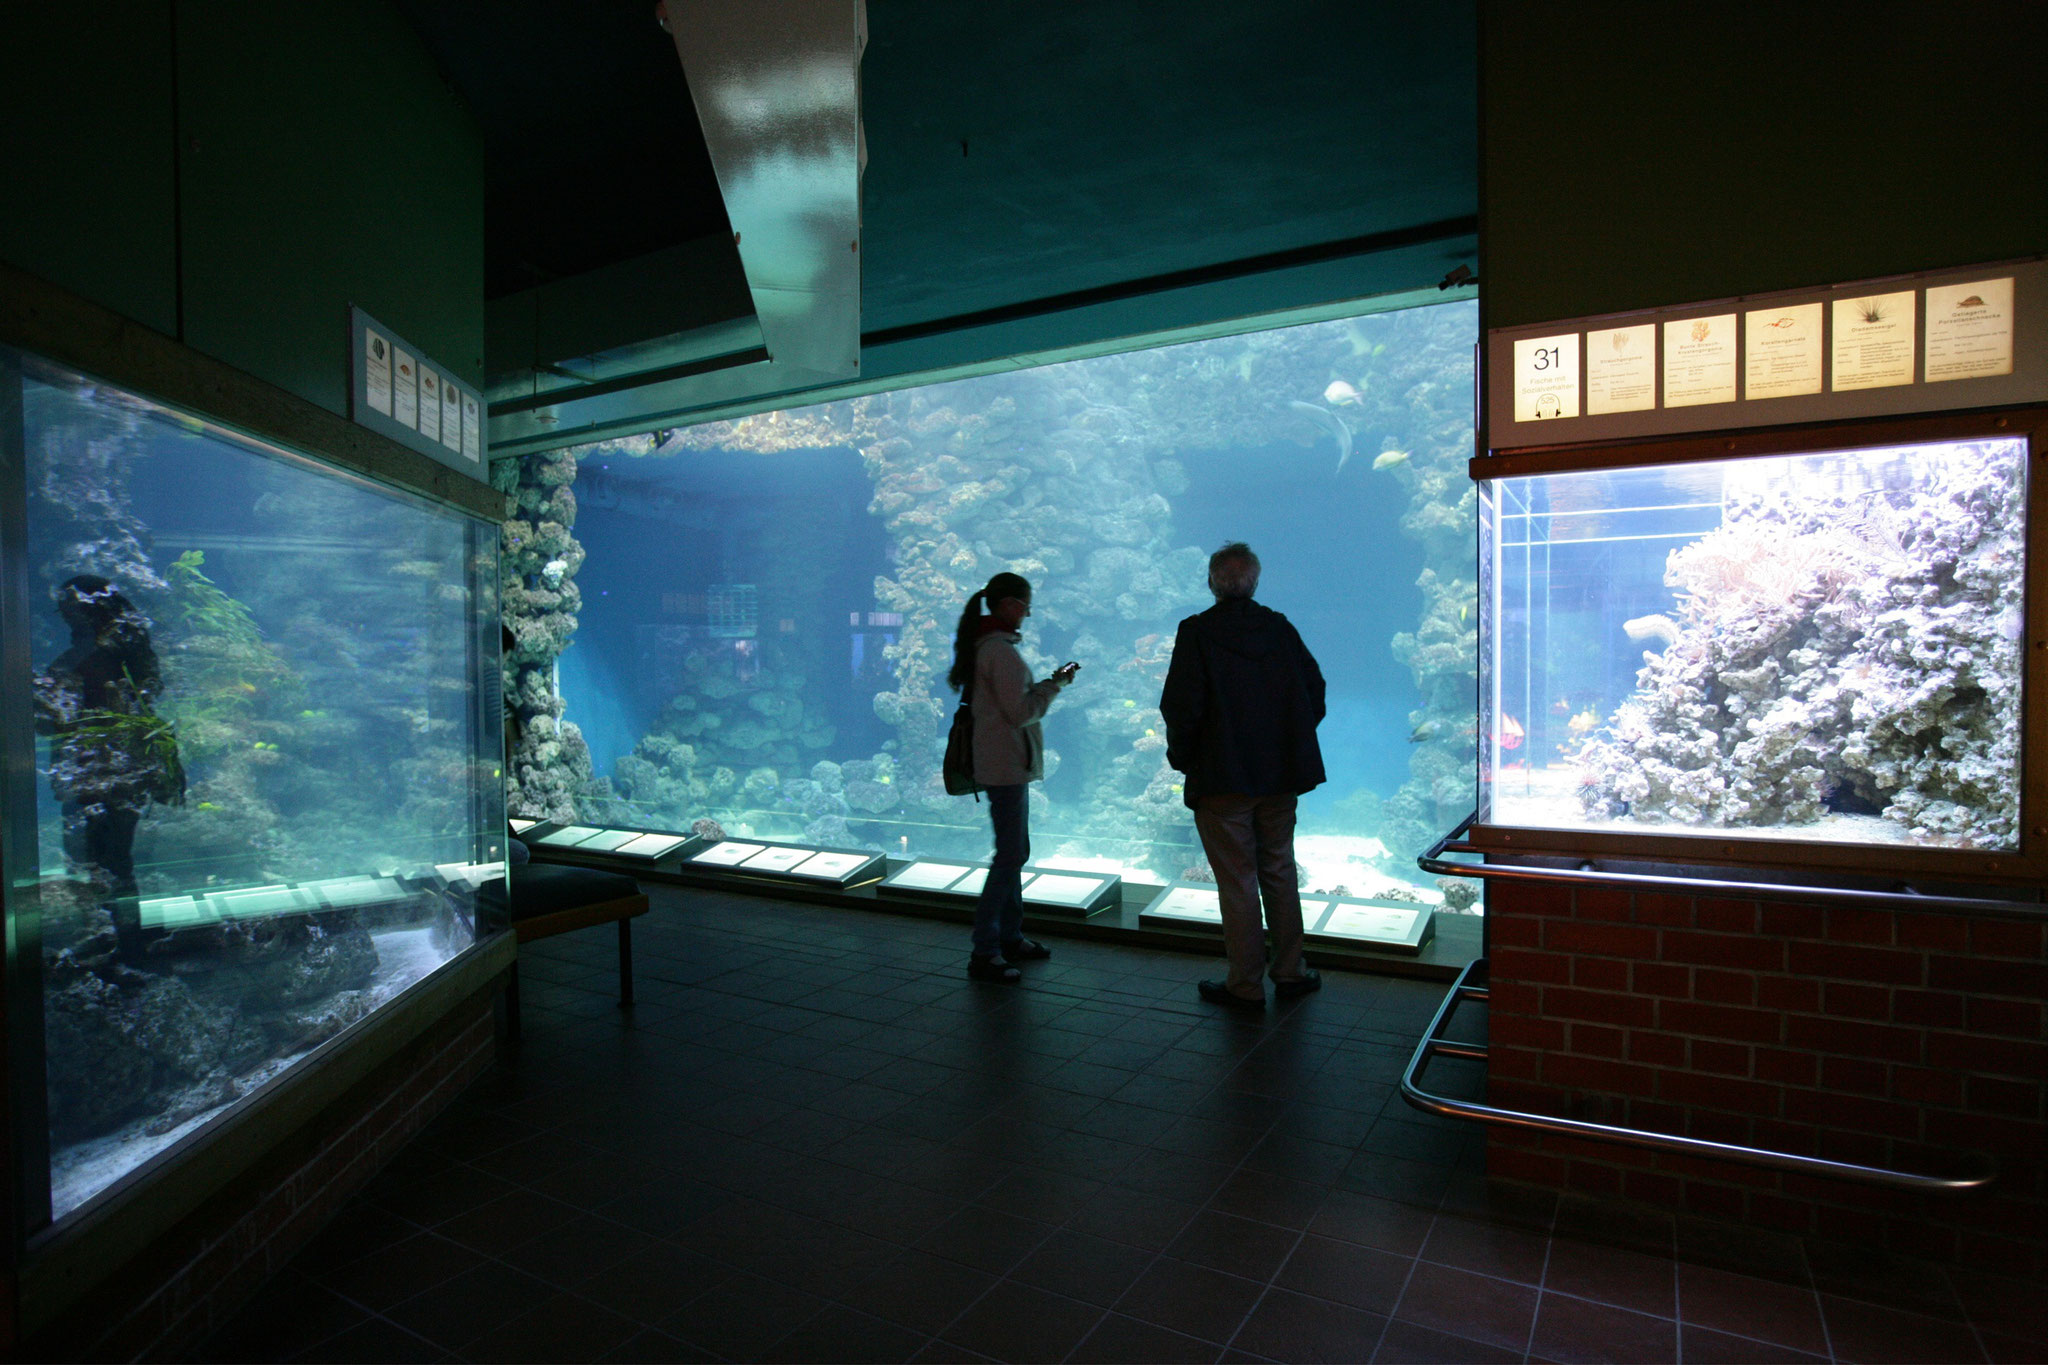 Panoramascheibe im tropischen Aquarium (Foto: Johannes-Maria Schlorke / Deutsches Meeresmuseum)